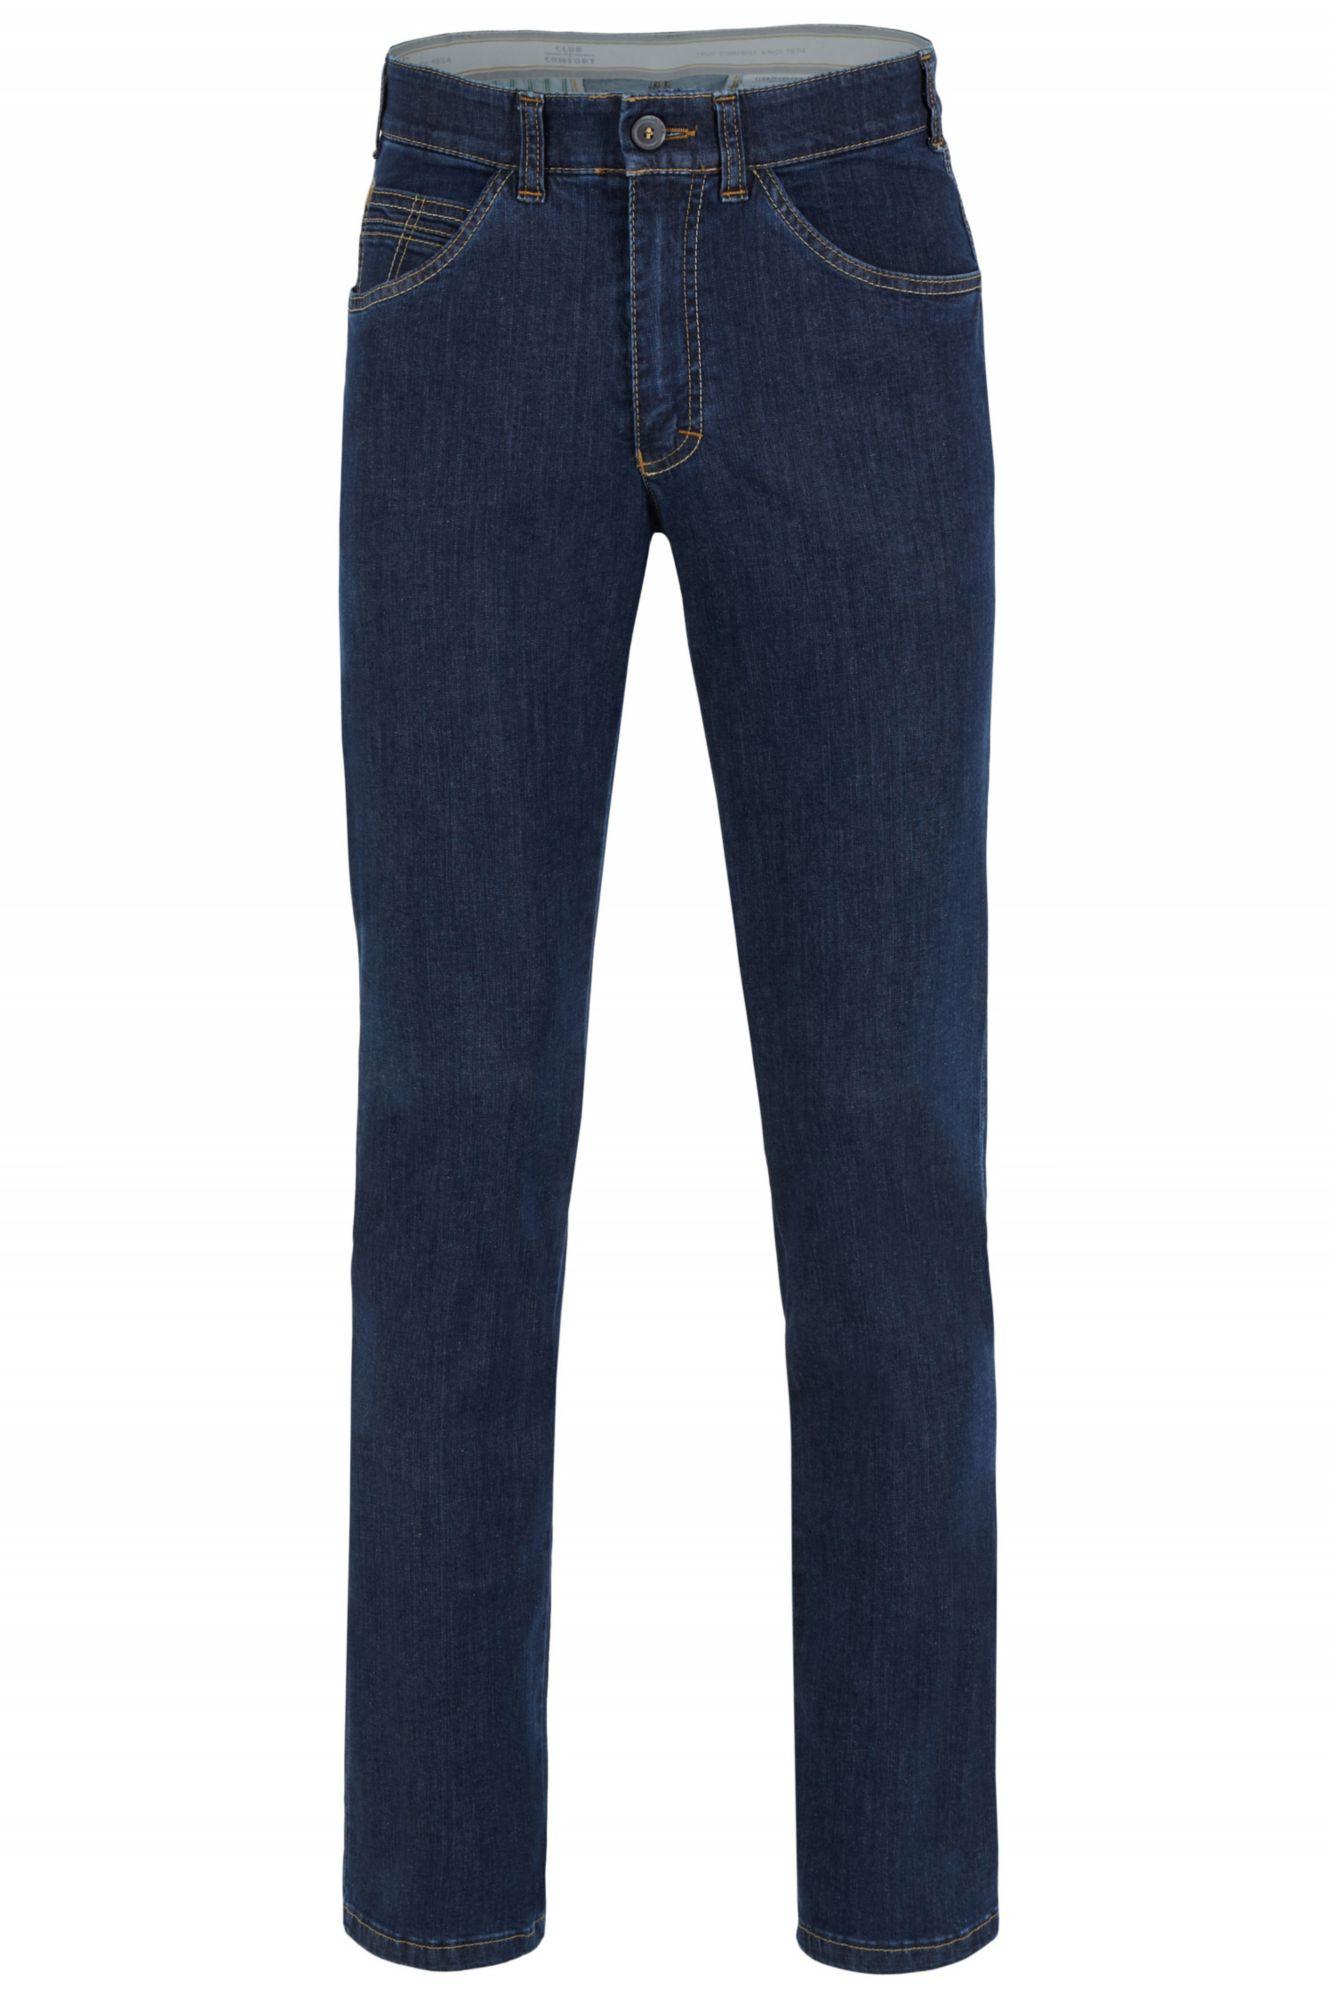 CLUB OF COMFORT Club of Comfort Jeans